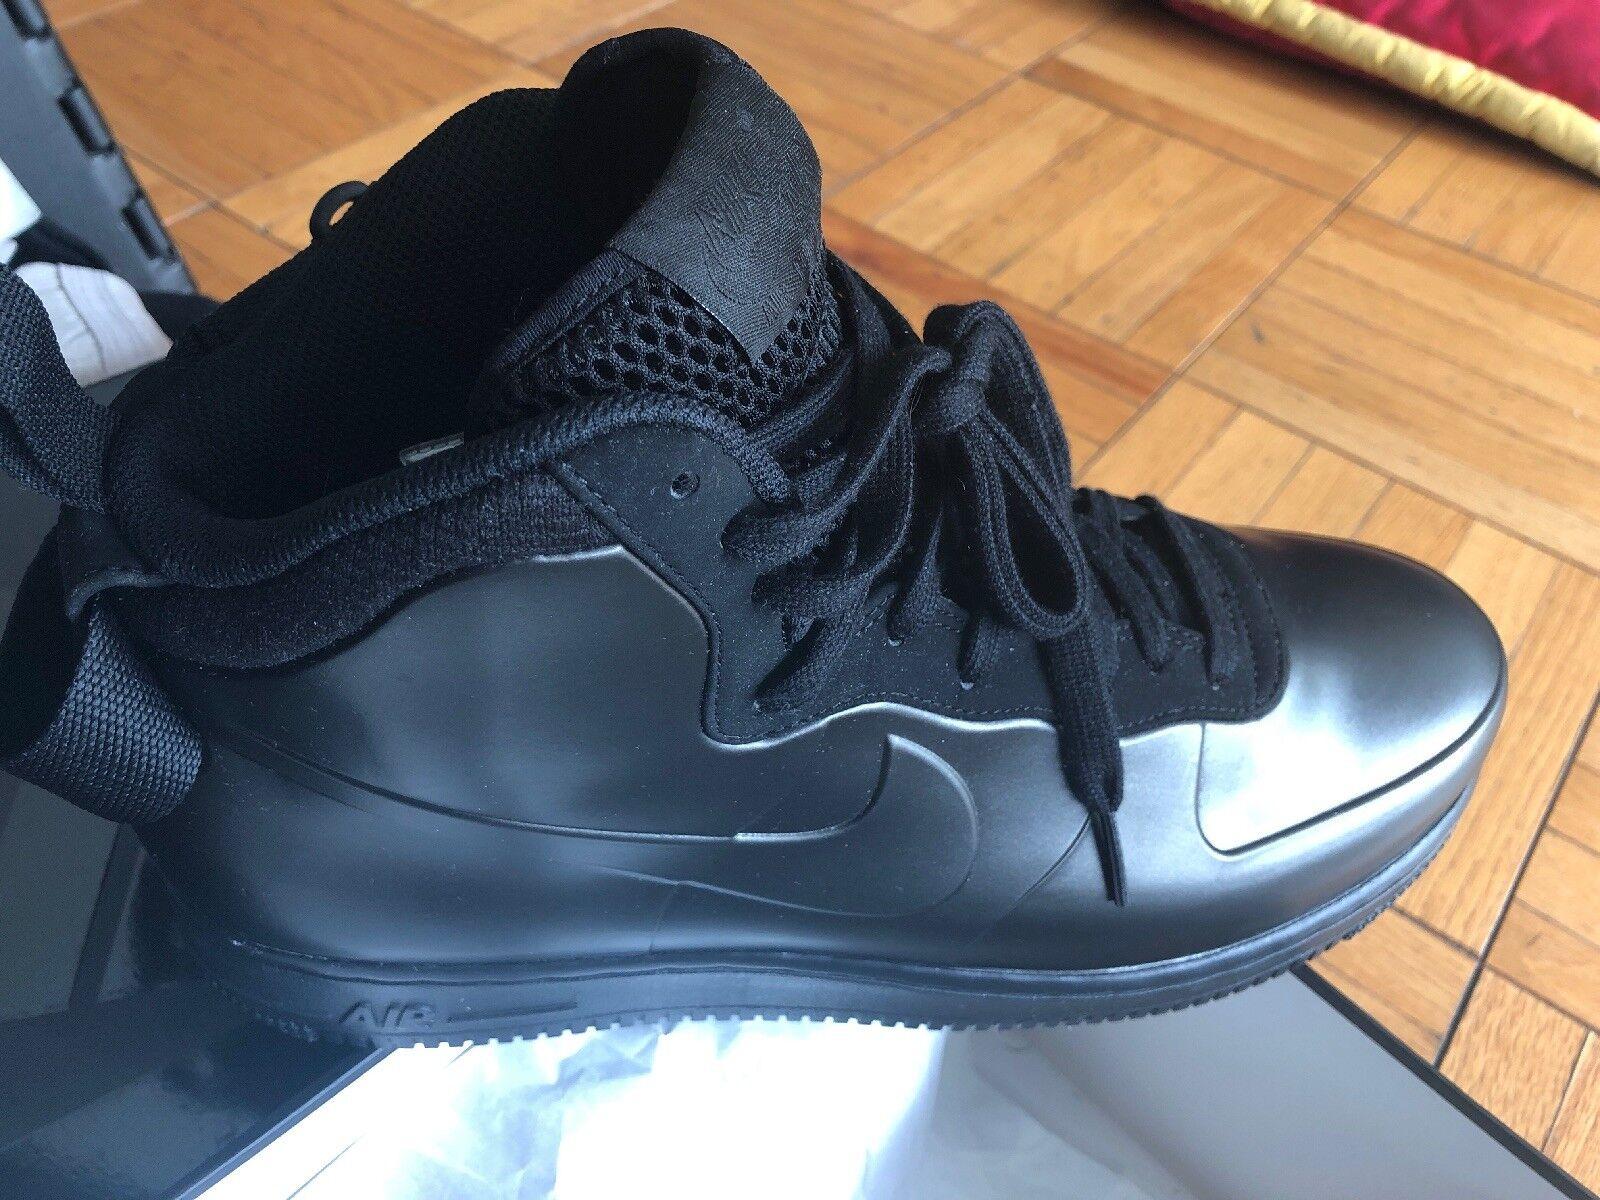 Nike Air Force 1 Foamposite Cup Size 9.5 Triple Nero AH6771-001